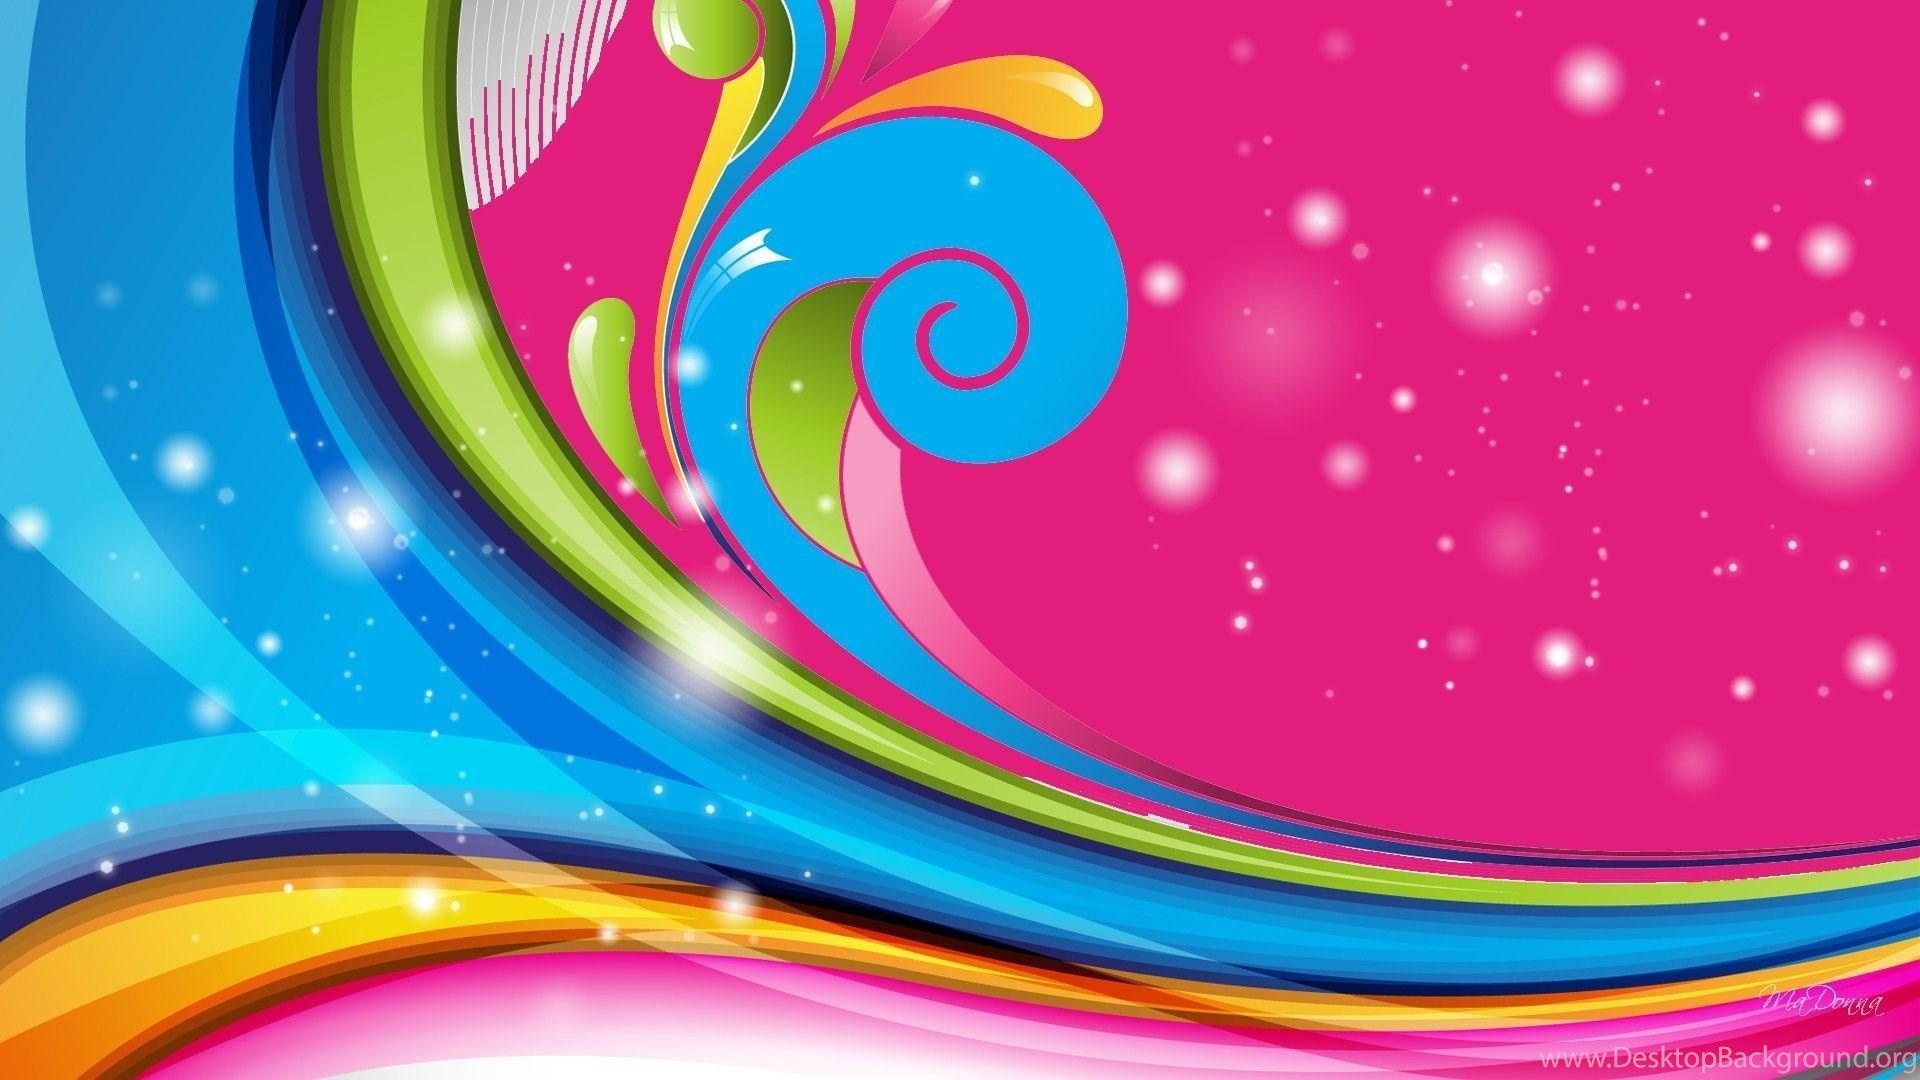 Rainbow Colors Wallpapers Wallpapers Cave Desktop Background